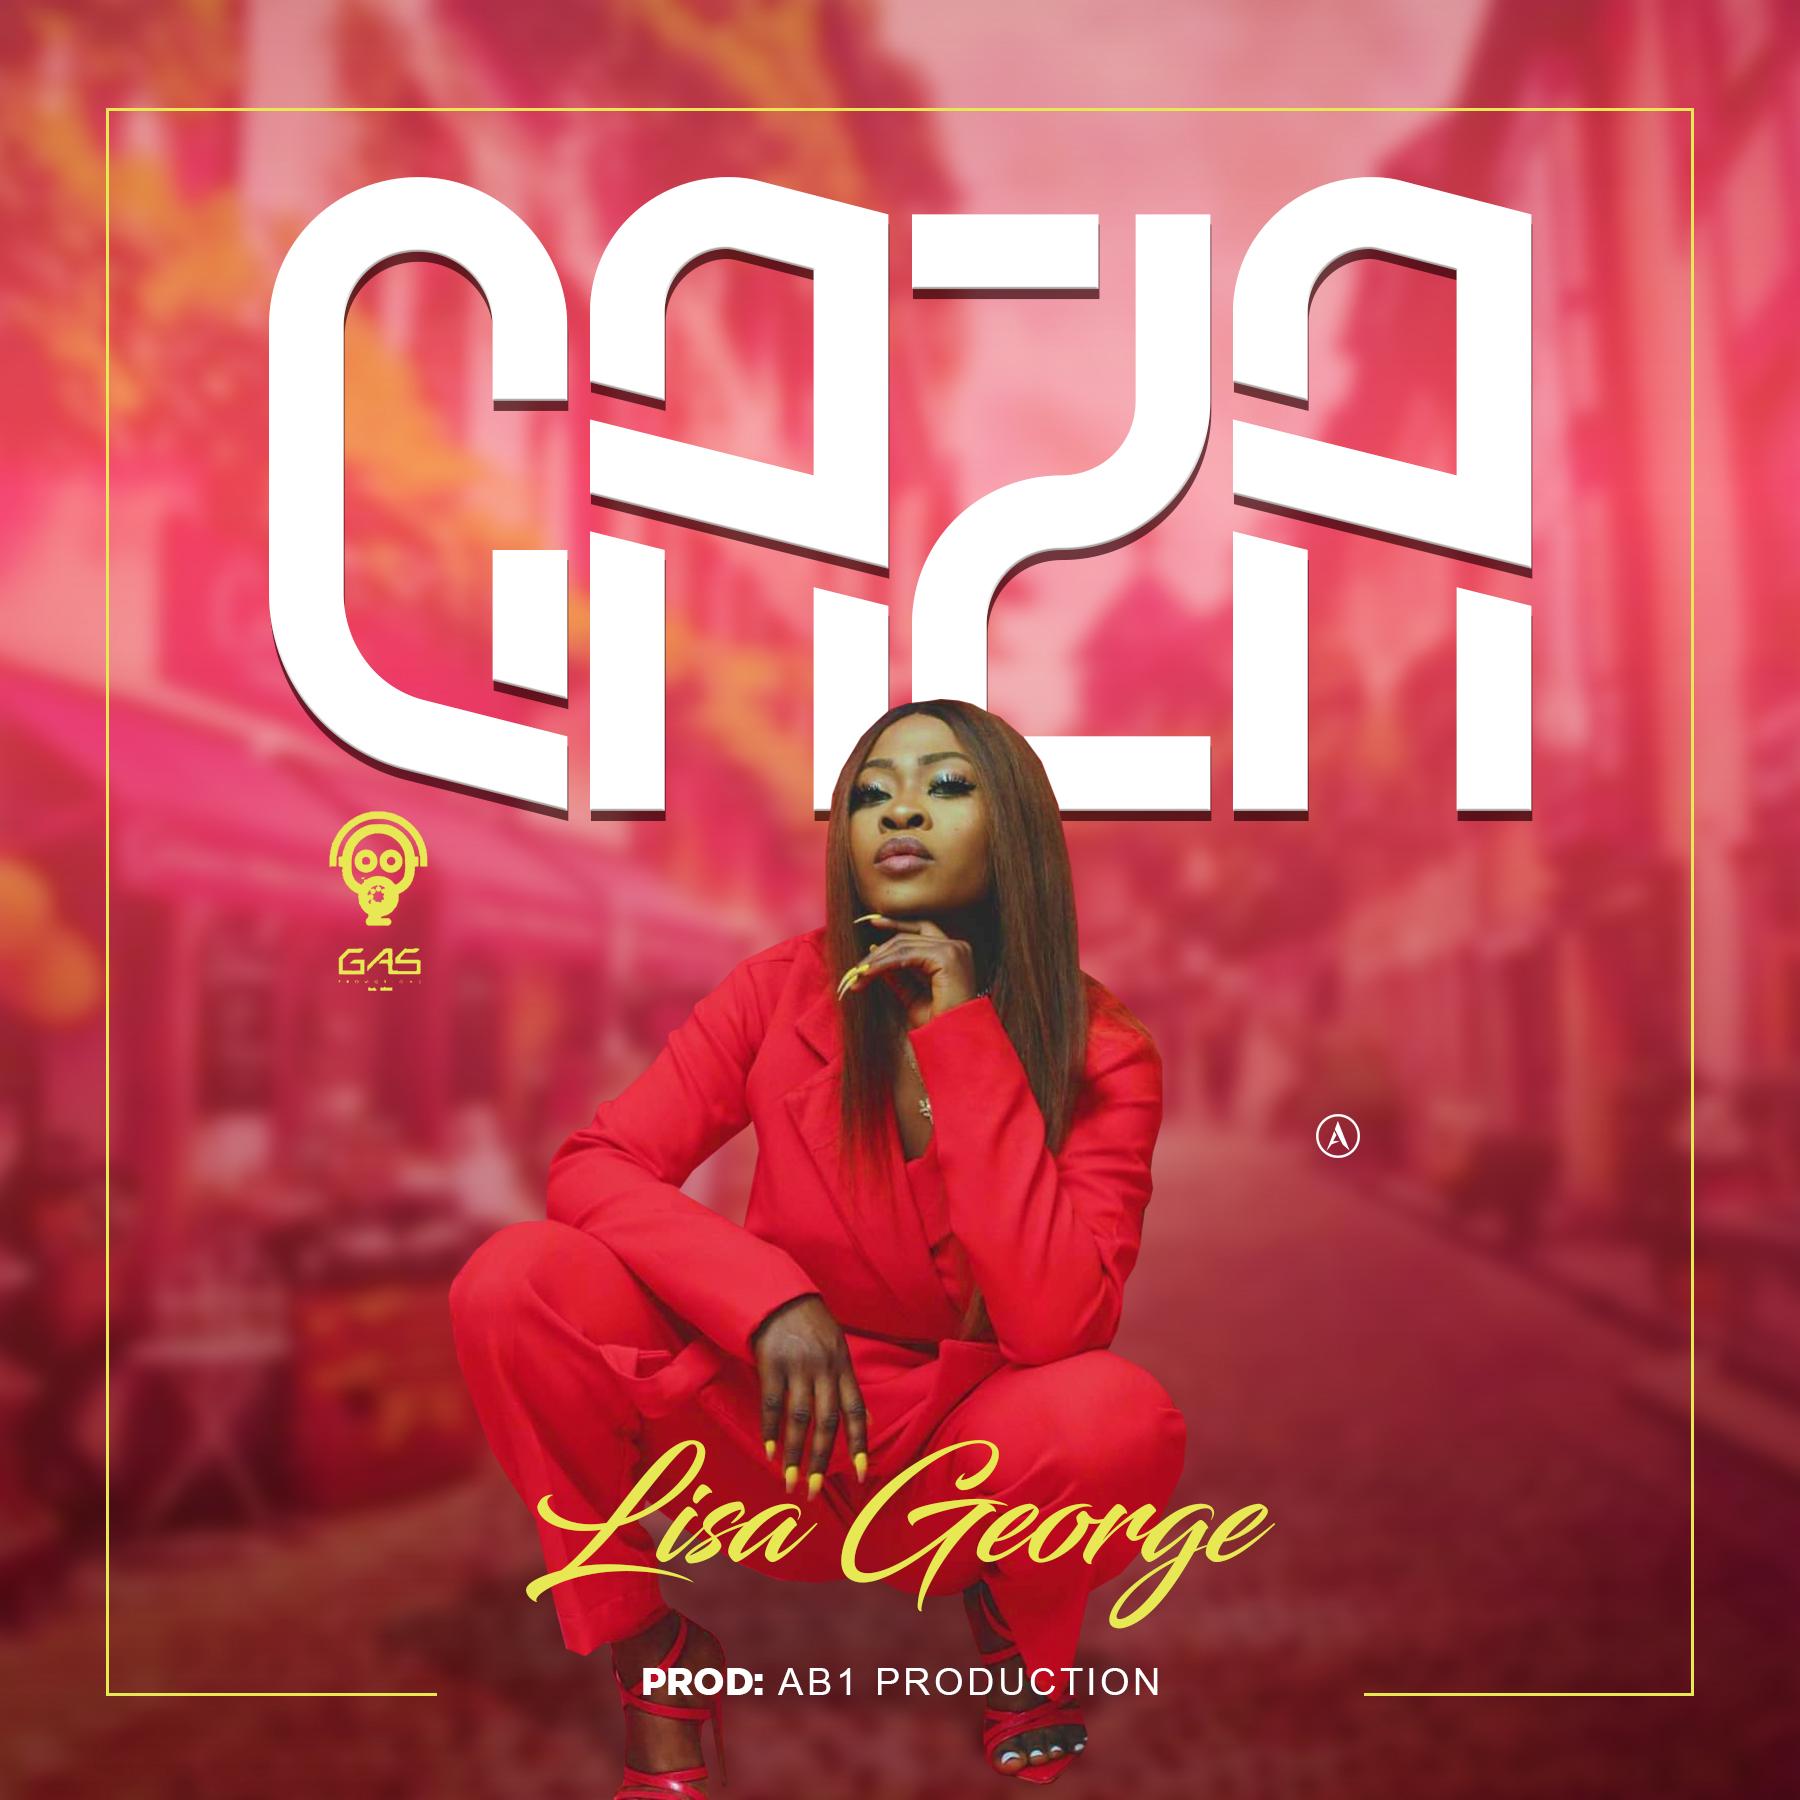 LISA GEORGE – GAZA (PROD. BY AB1 PRODUCTION)